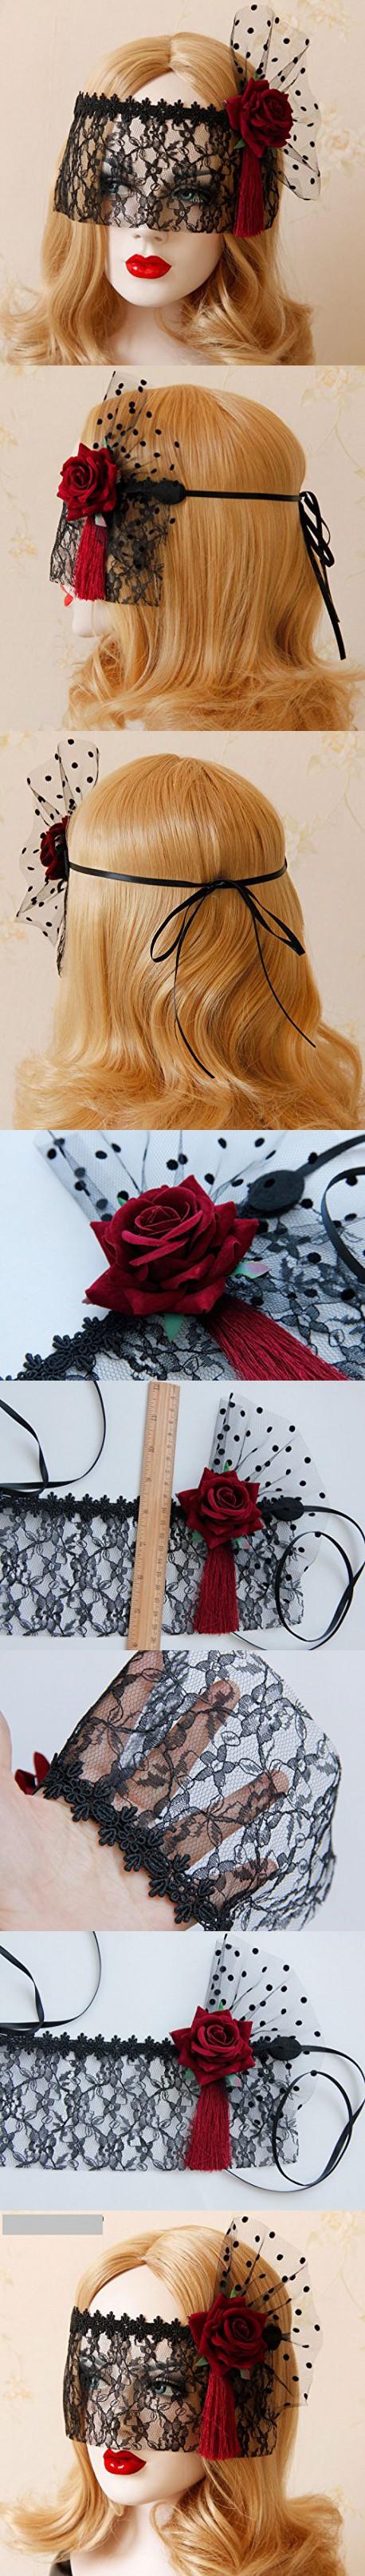 Idealgo retro black lace veil cover headdress funny party half face